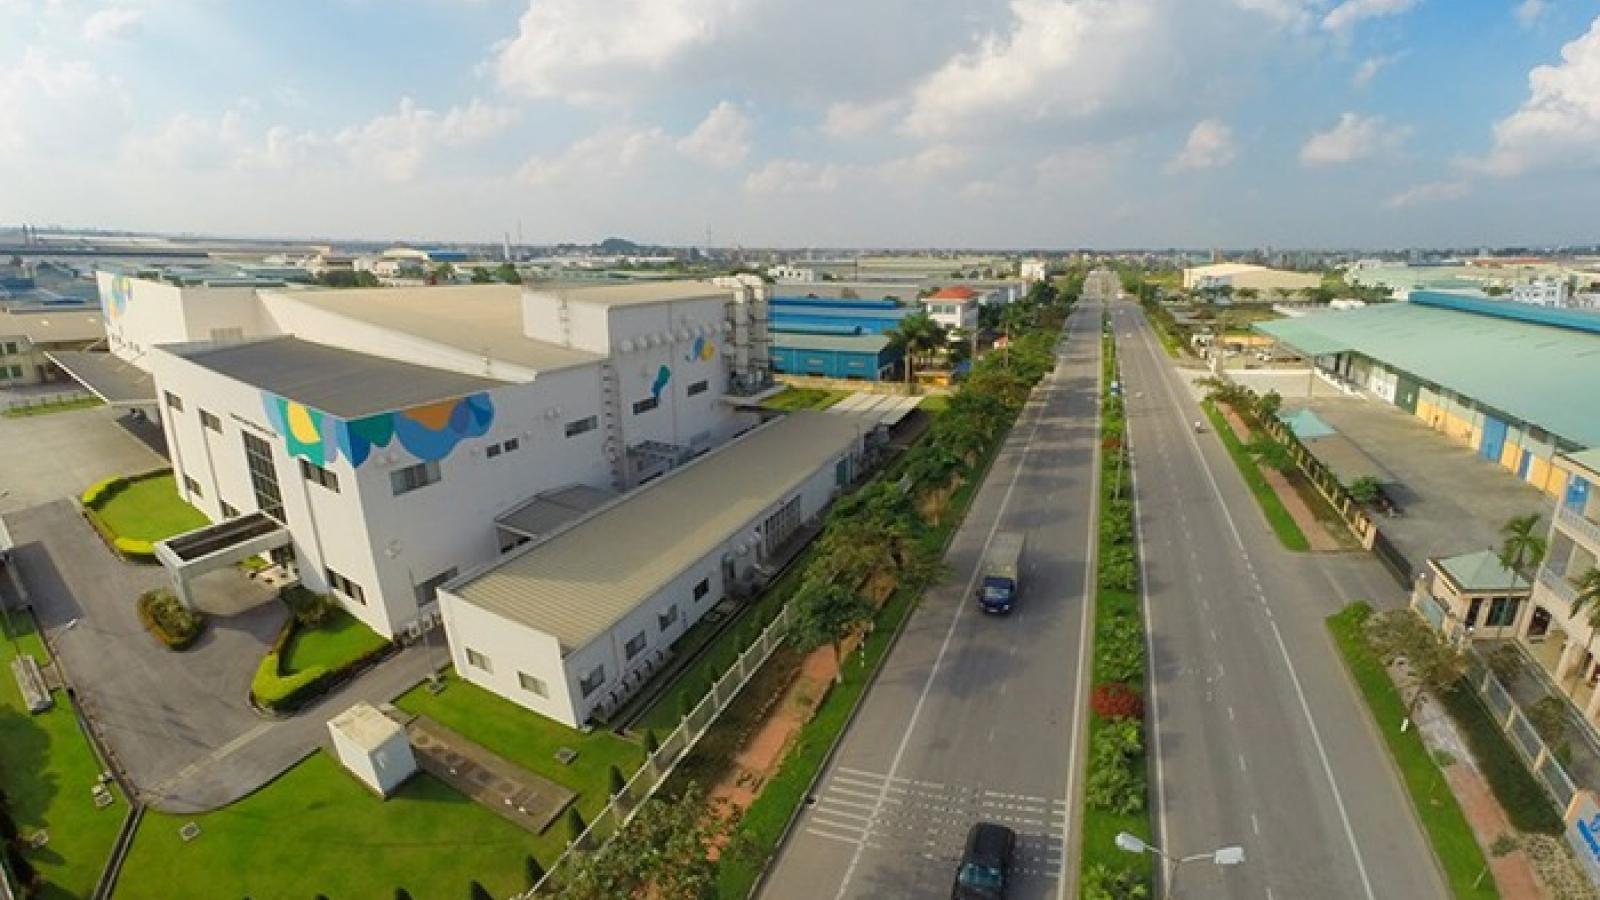 Vietnam emerges as destination for international industrial property investors